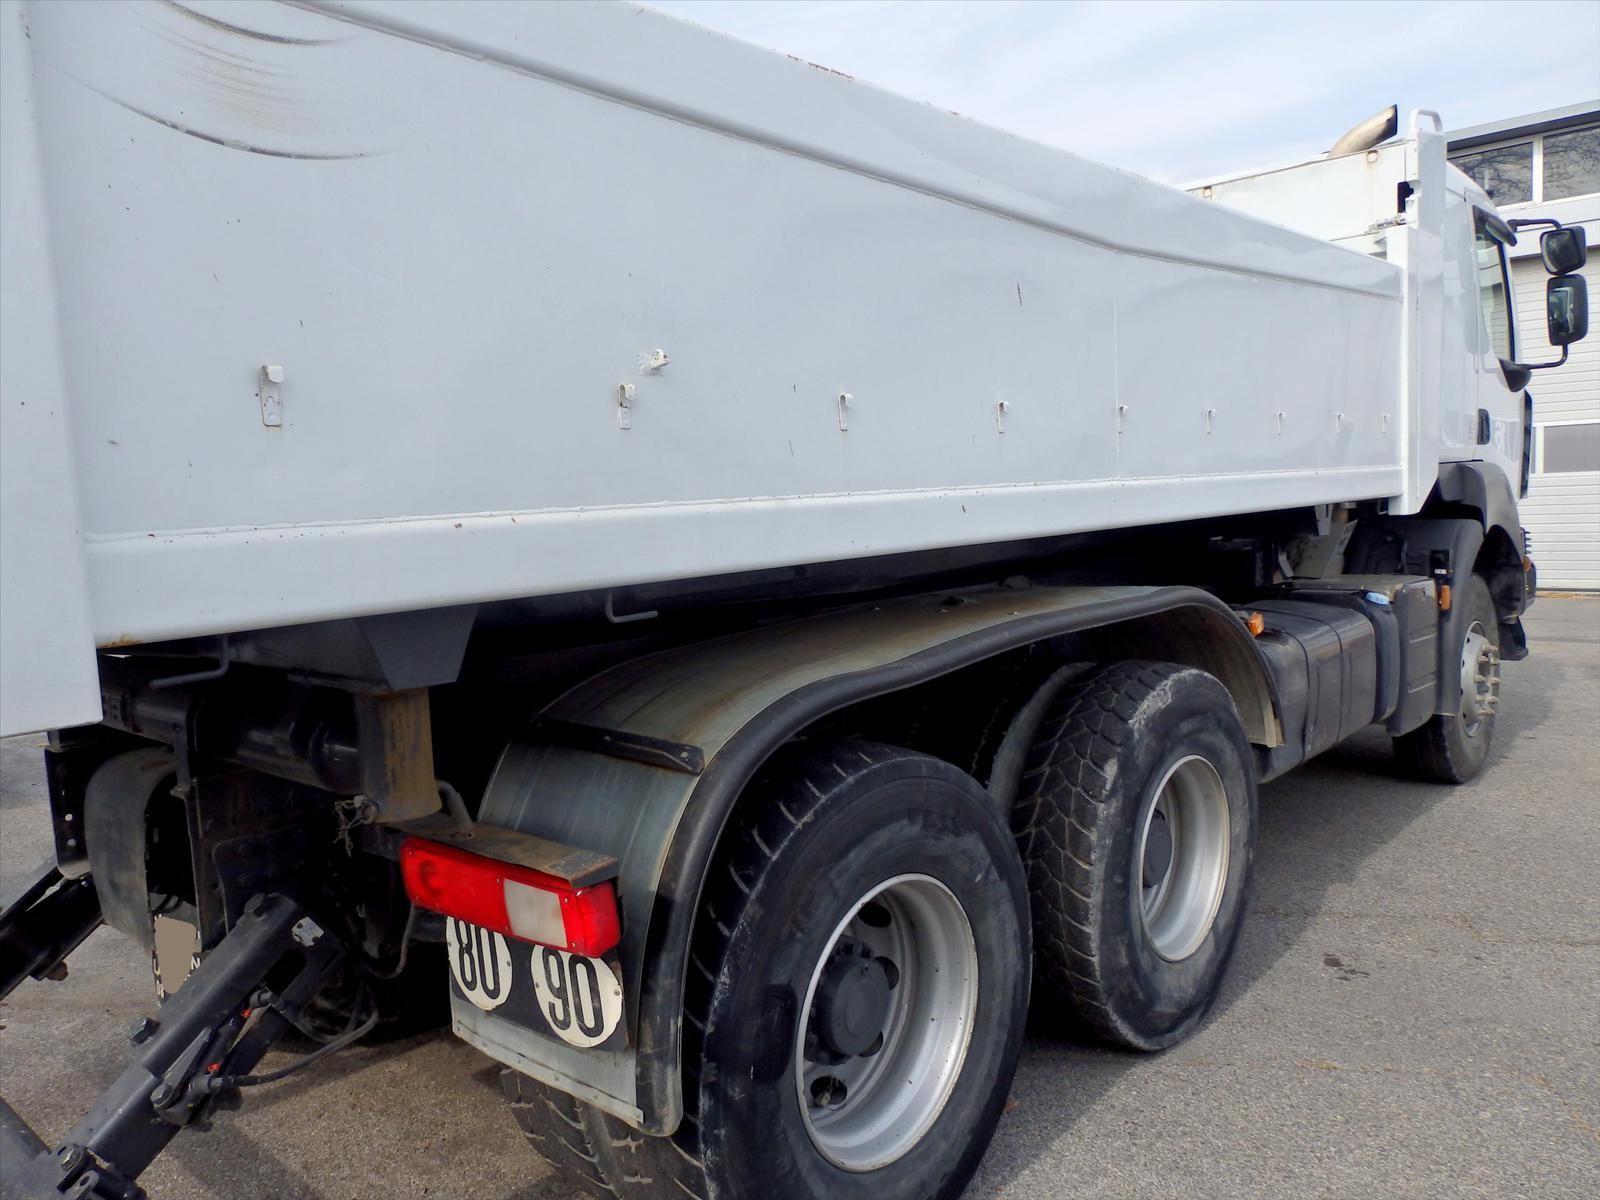 Camion KERAX 410 6x4 BiBenne Hydraulique RVI Renault Tel: 0608066192 Pierre BASSAT Trans.Comm.13